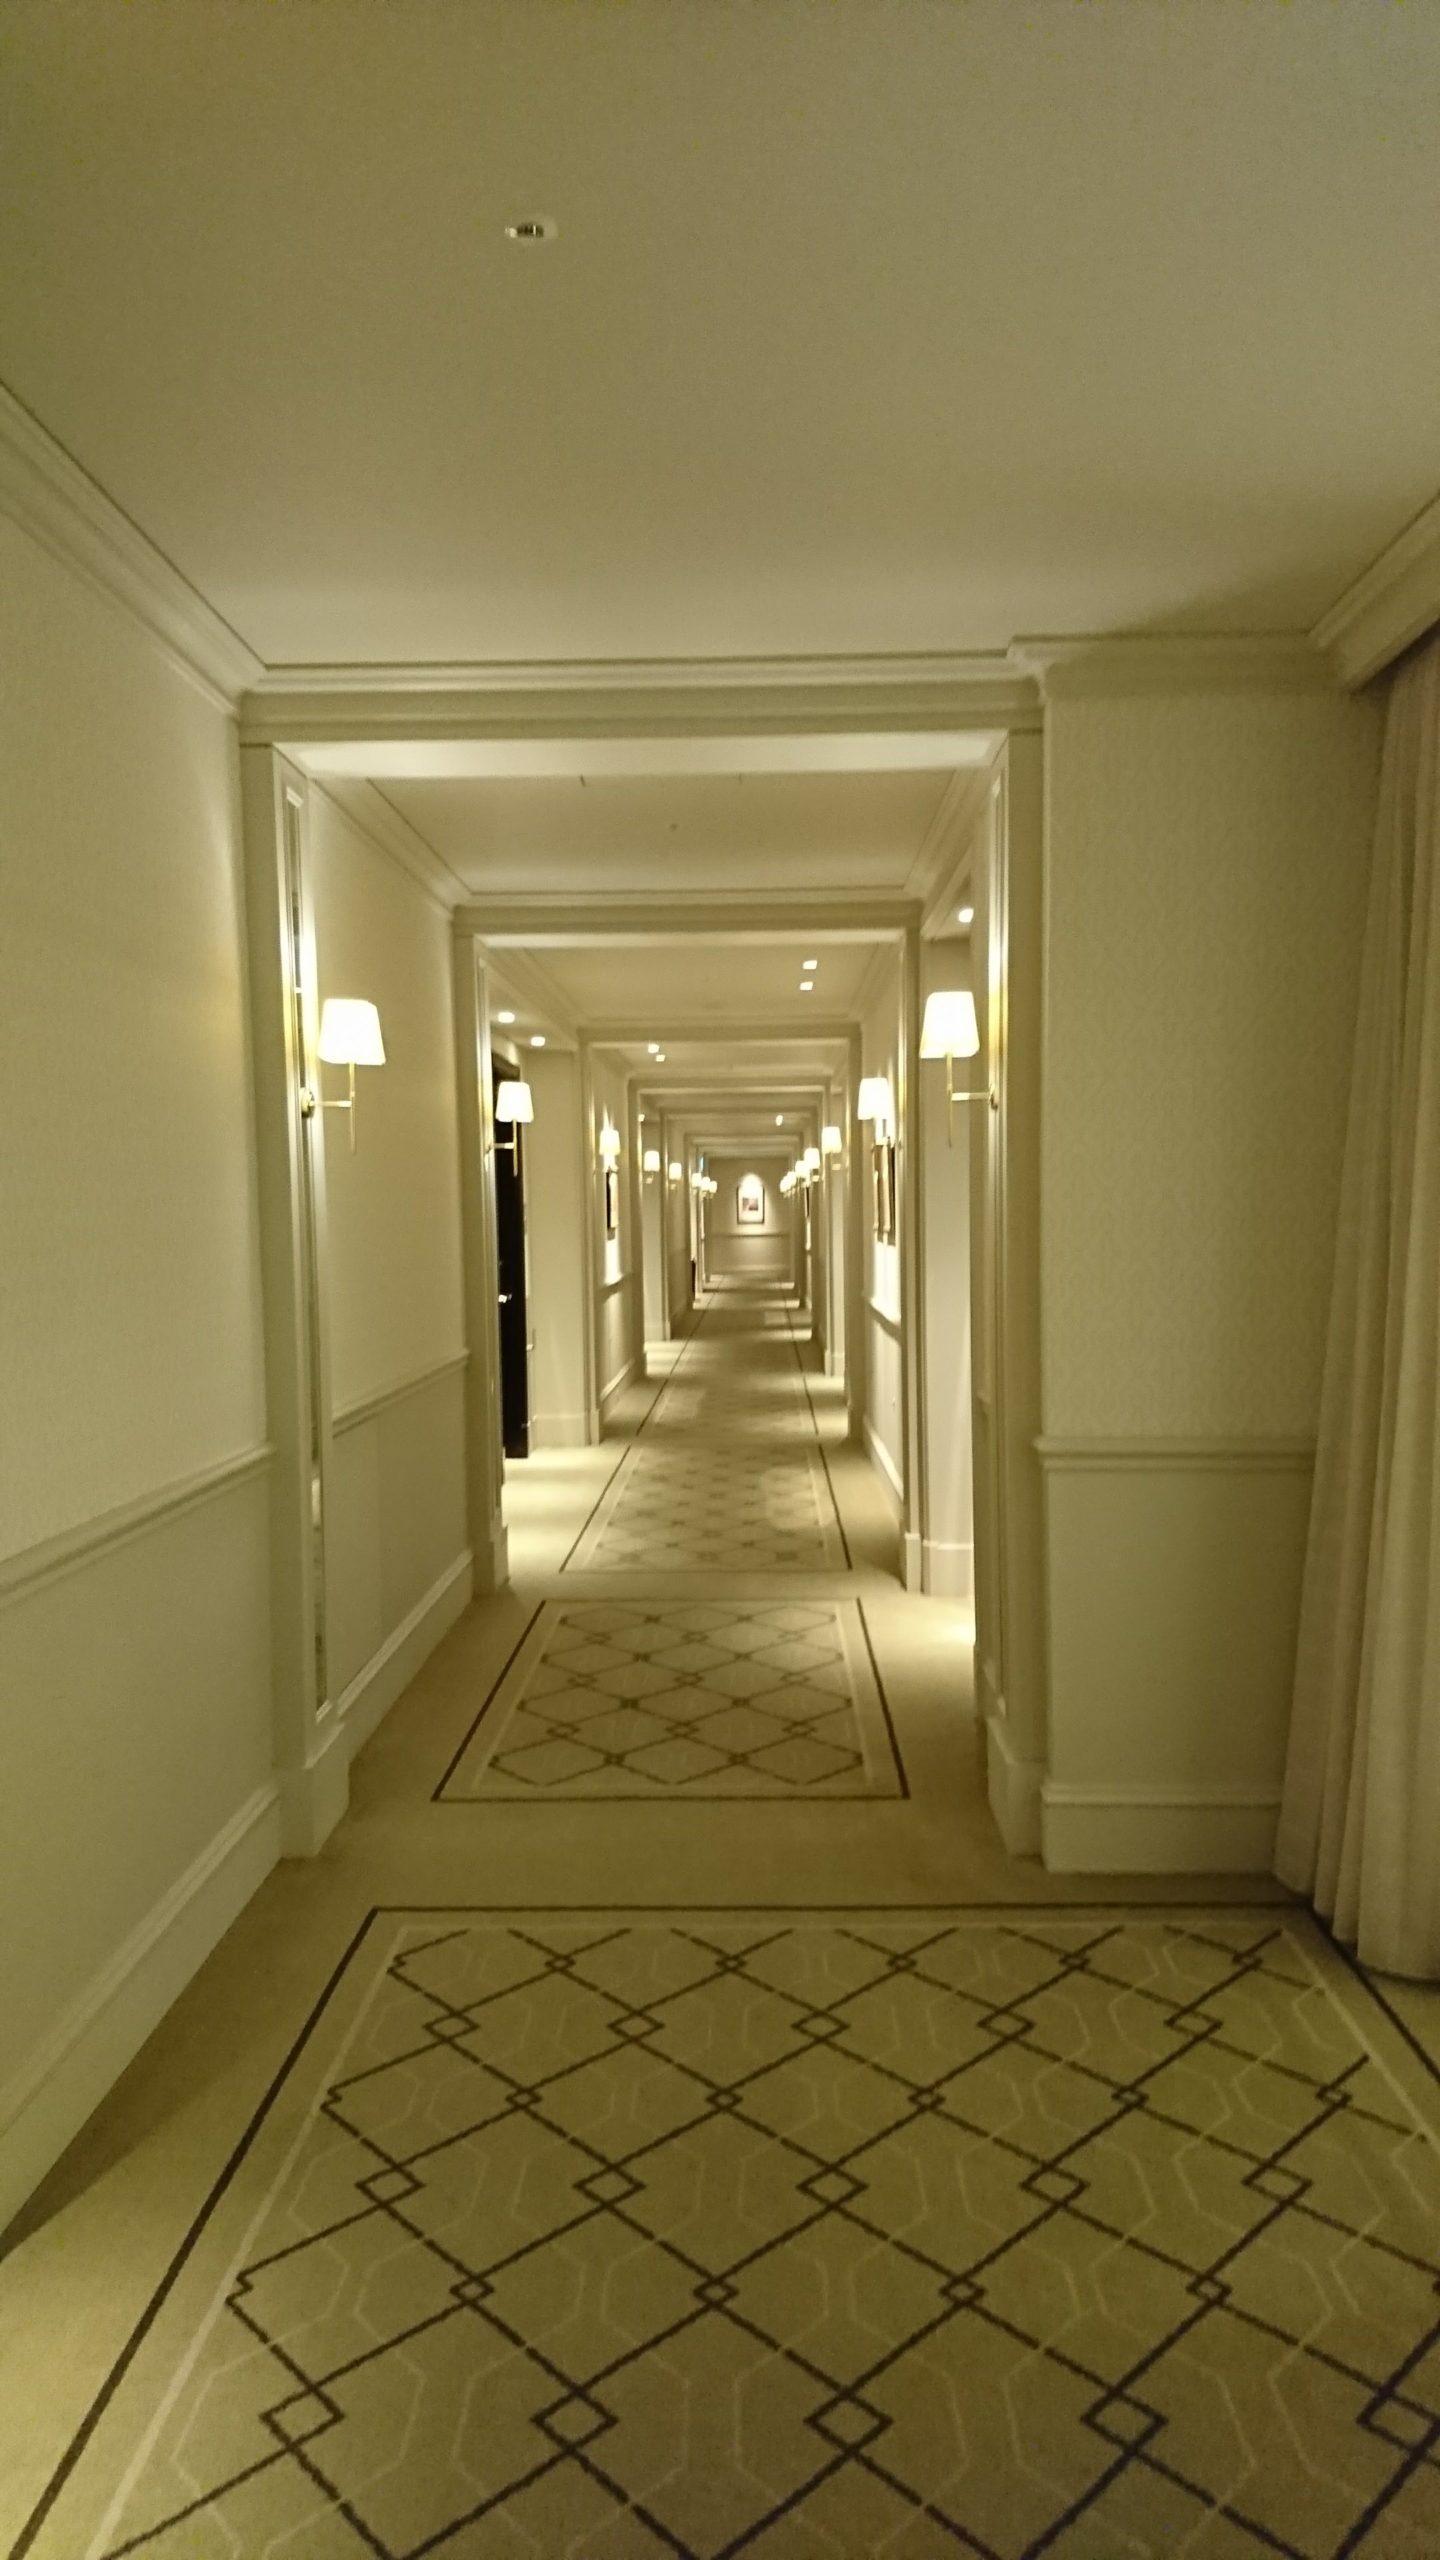 The corridor of Tokyo Station Hotel